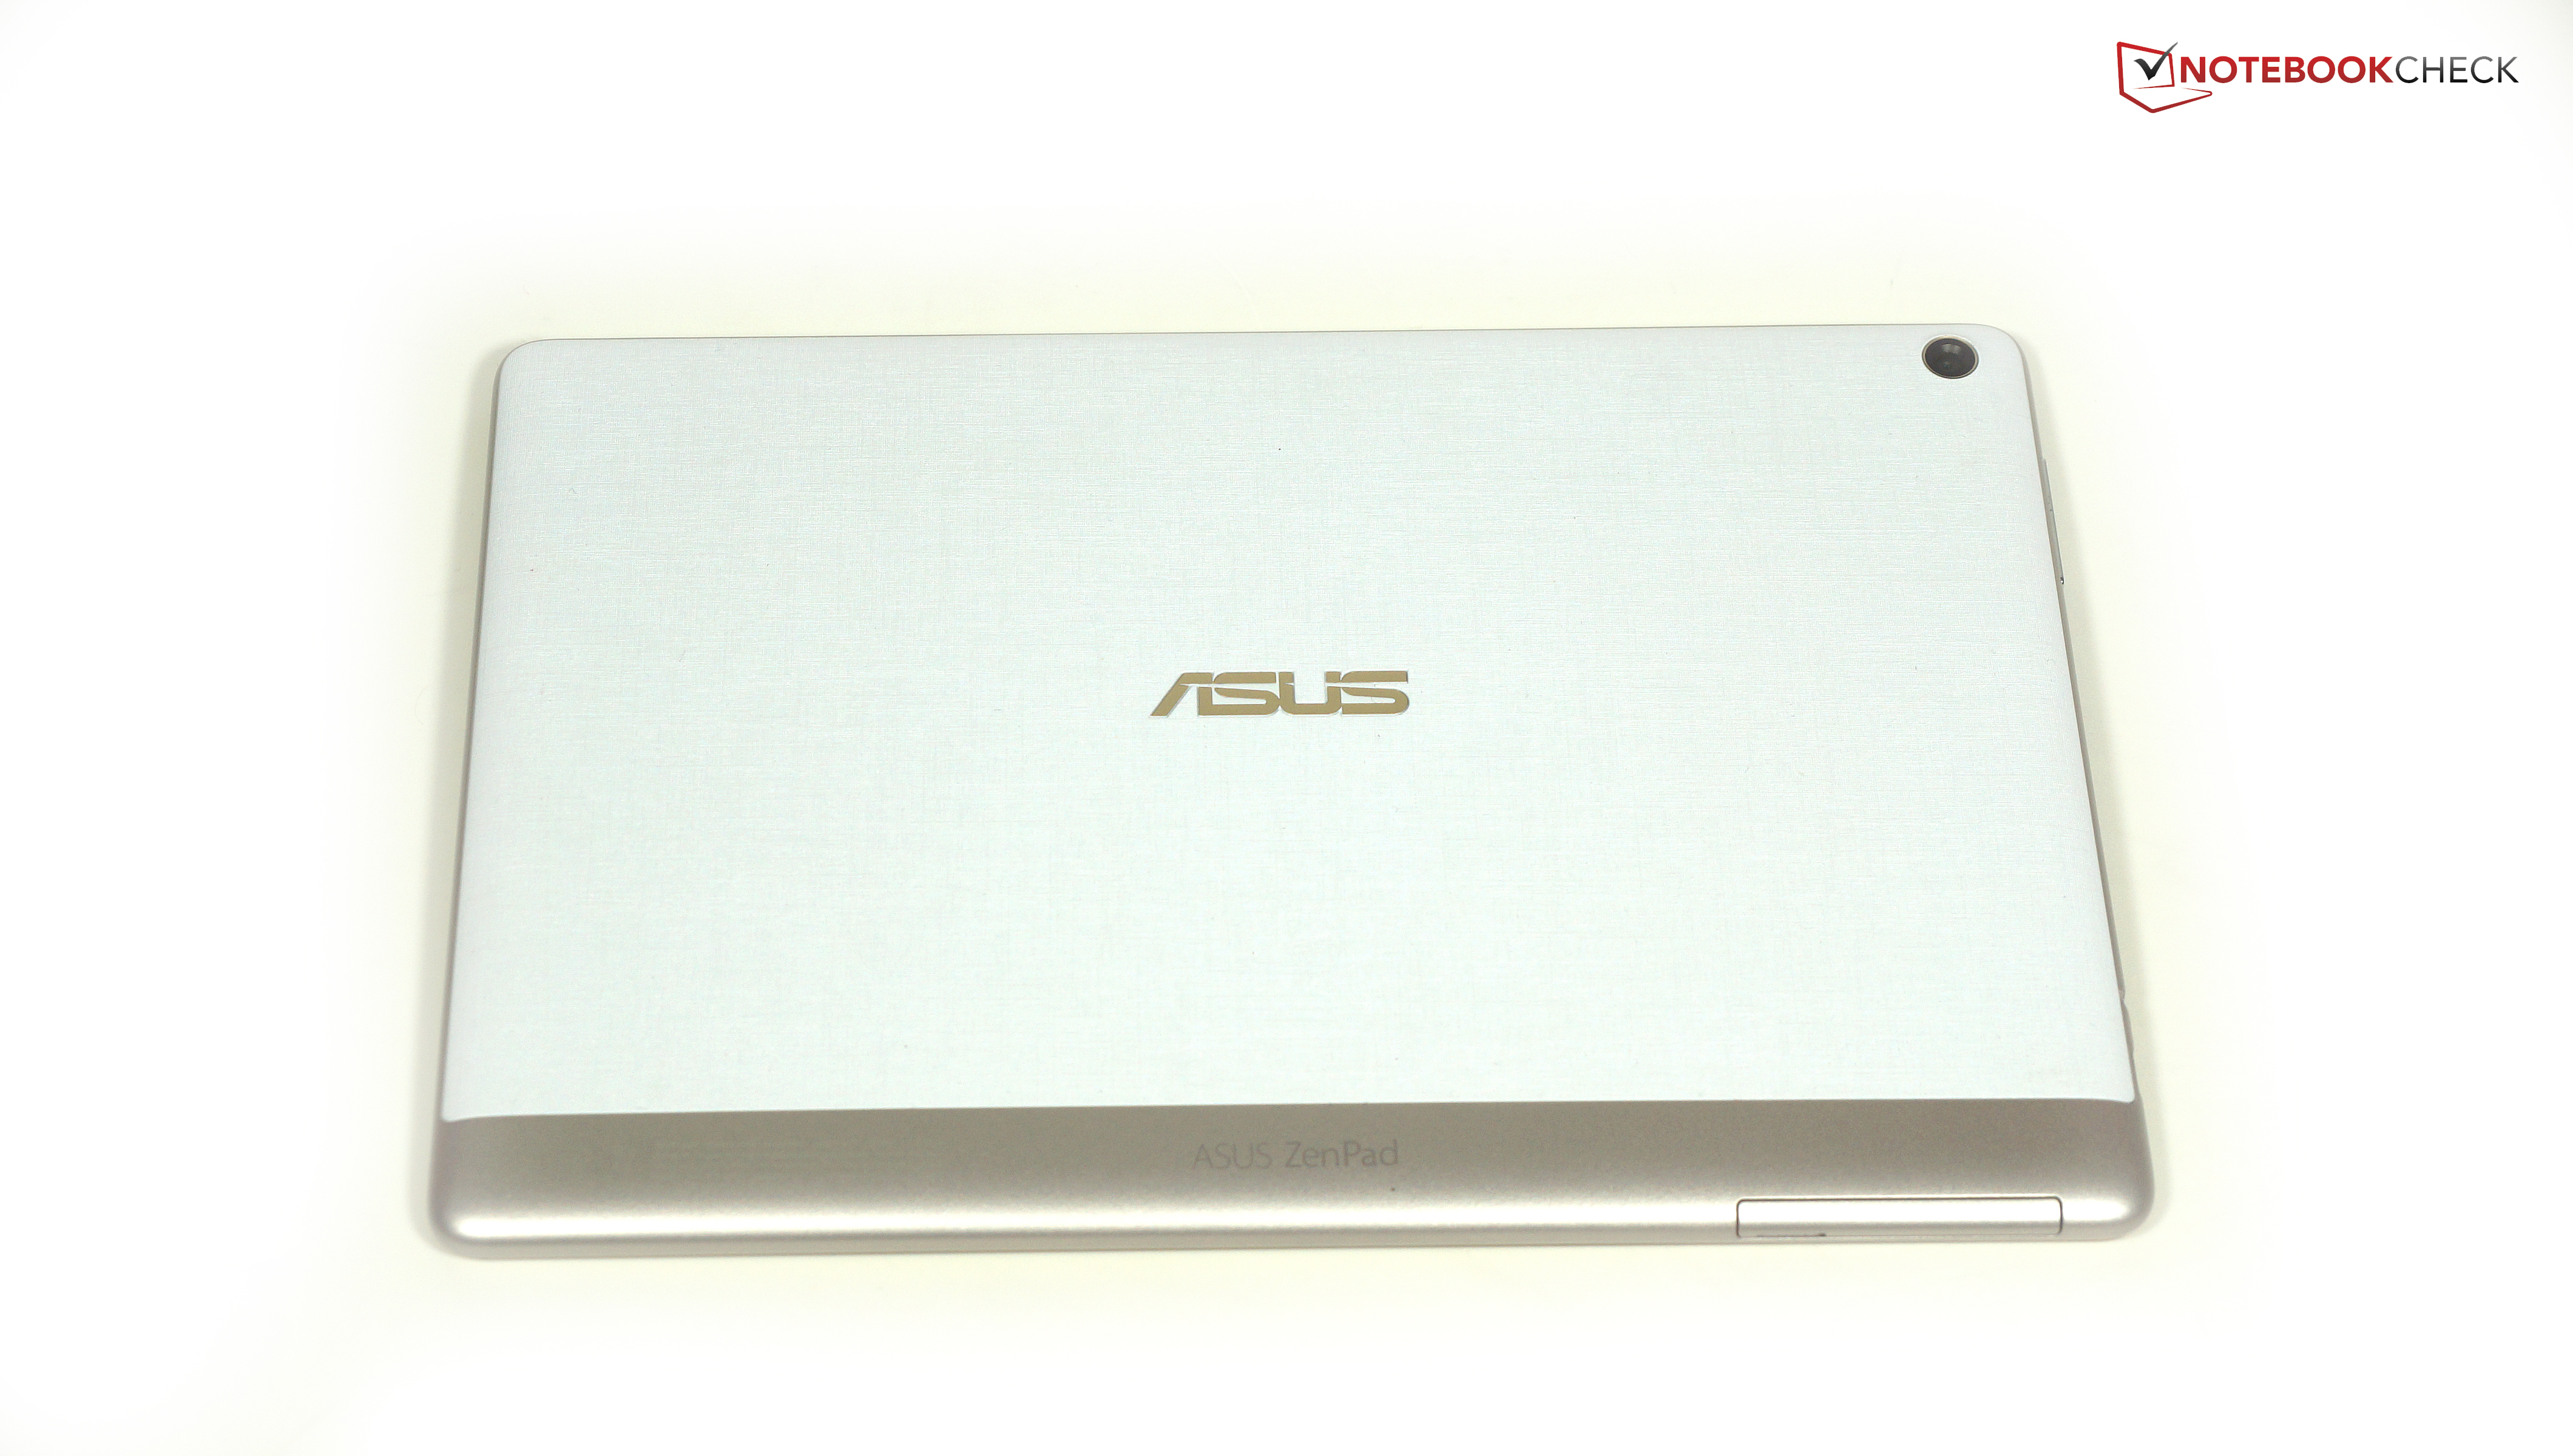 Asus ZenPad 10 (Z301ML) Tablet Review - NotebookCheck net